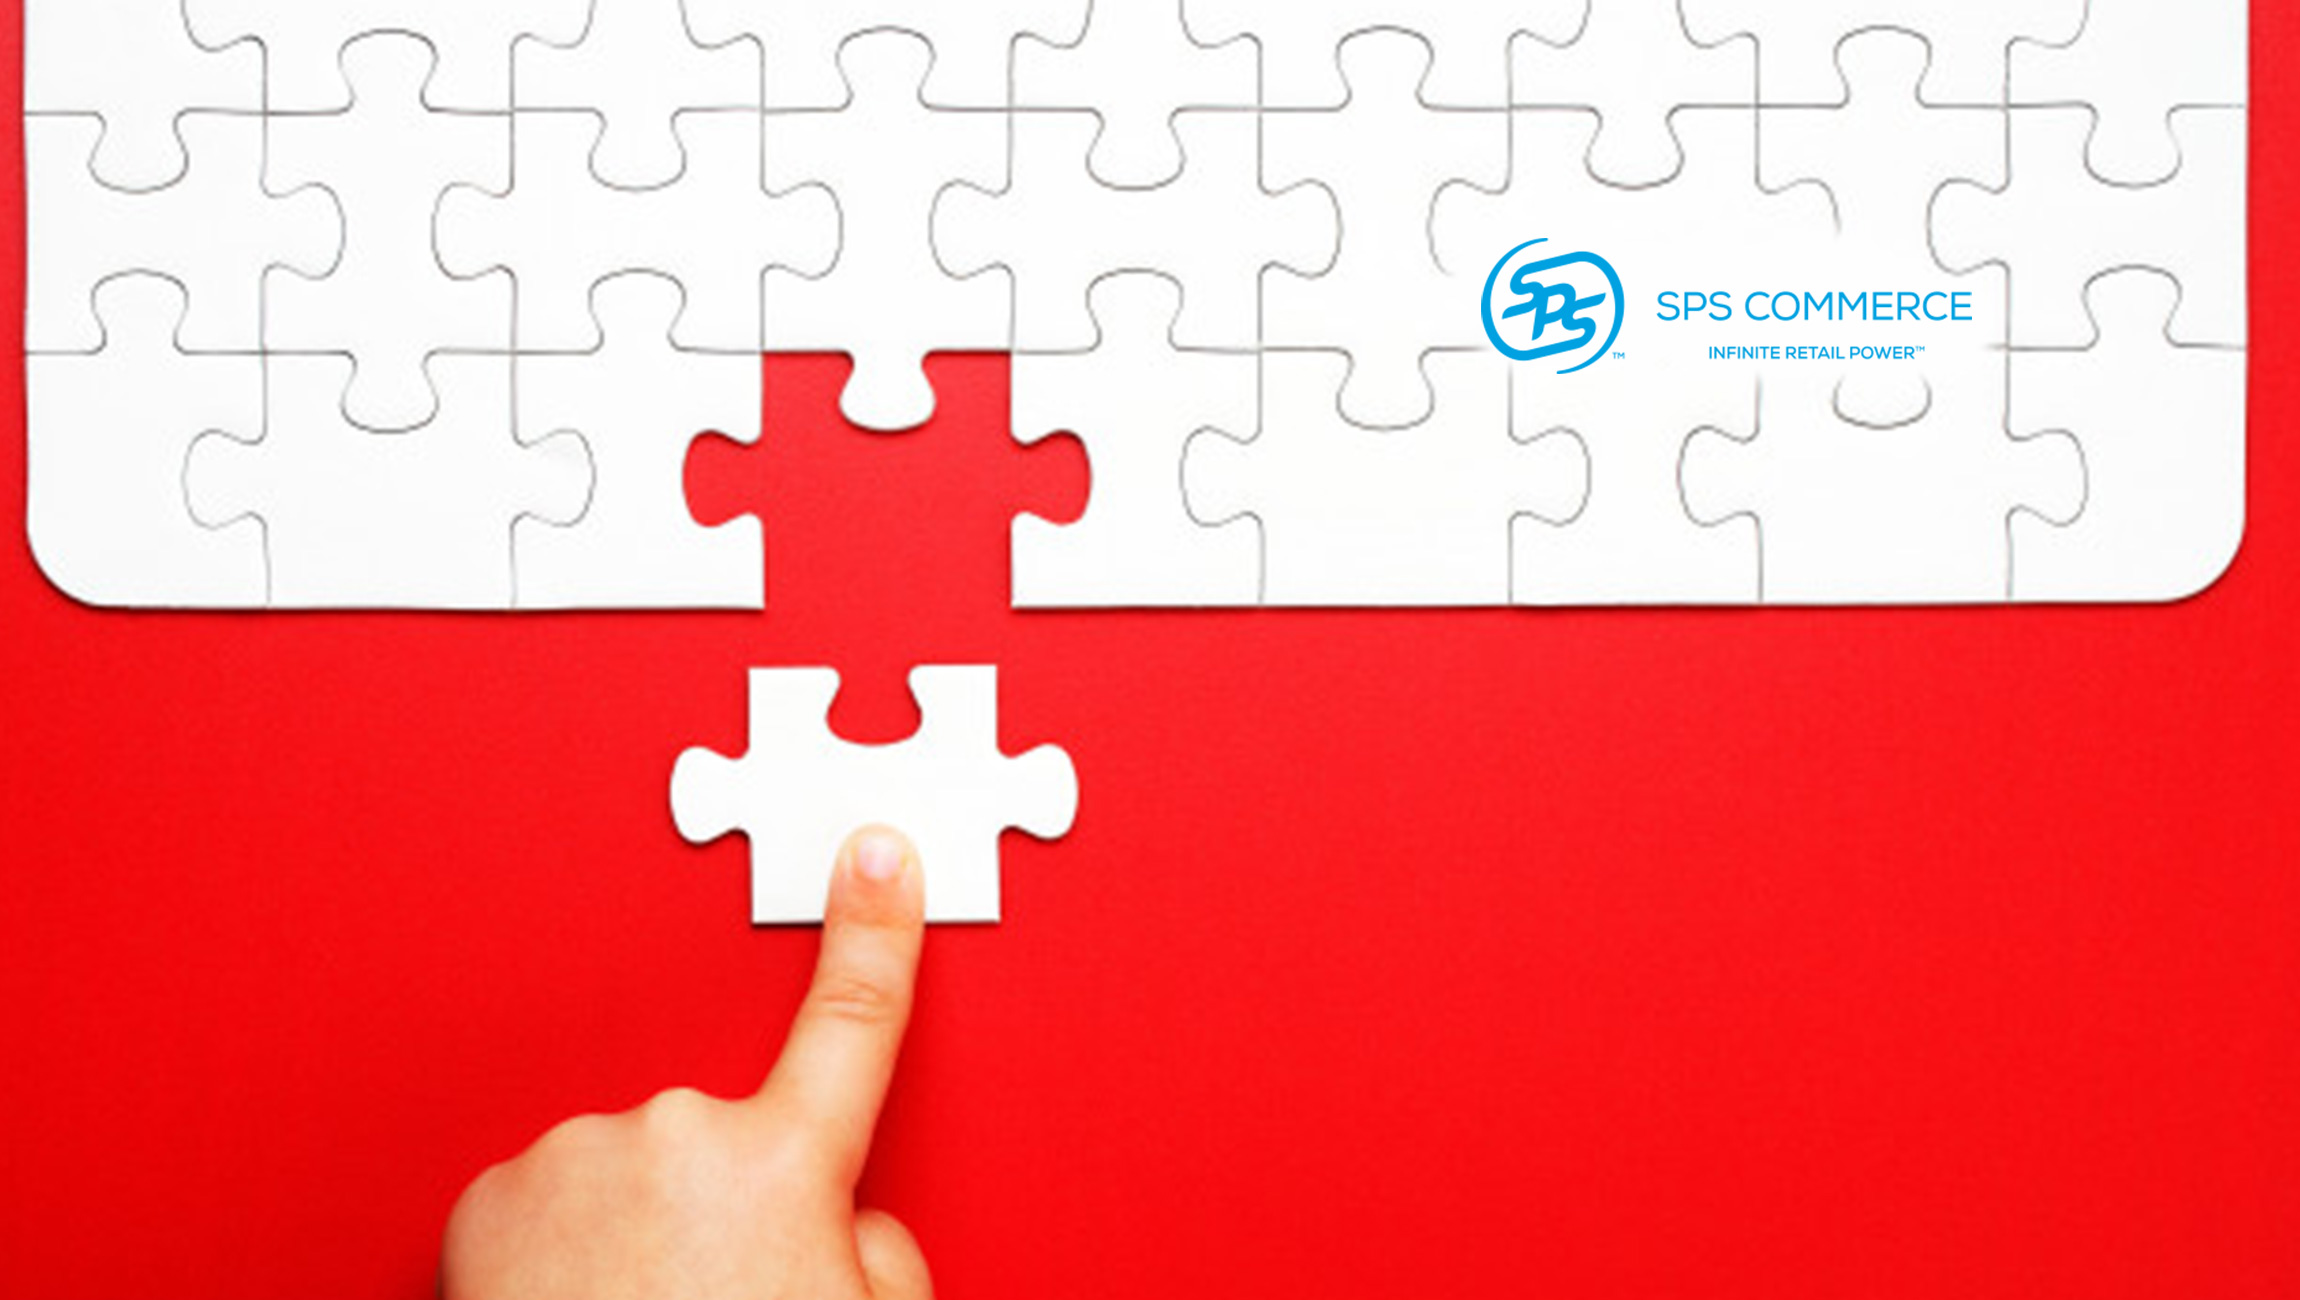 sps commerce acquires mapadoc